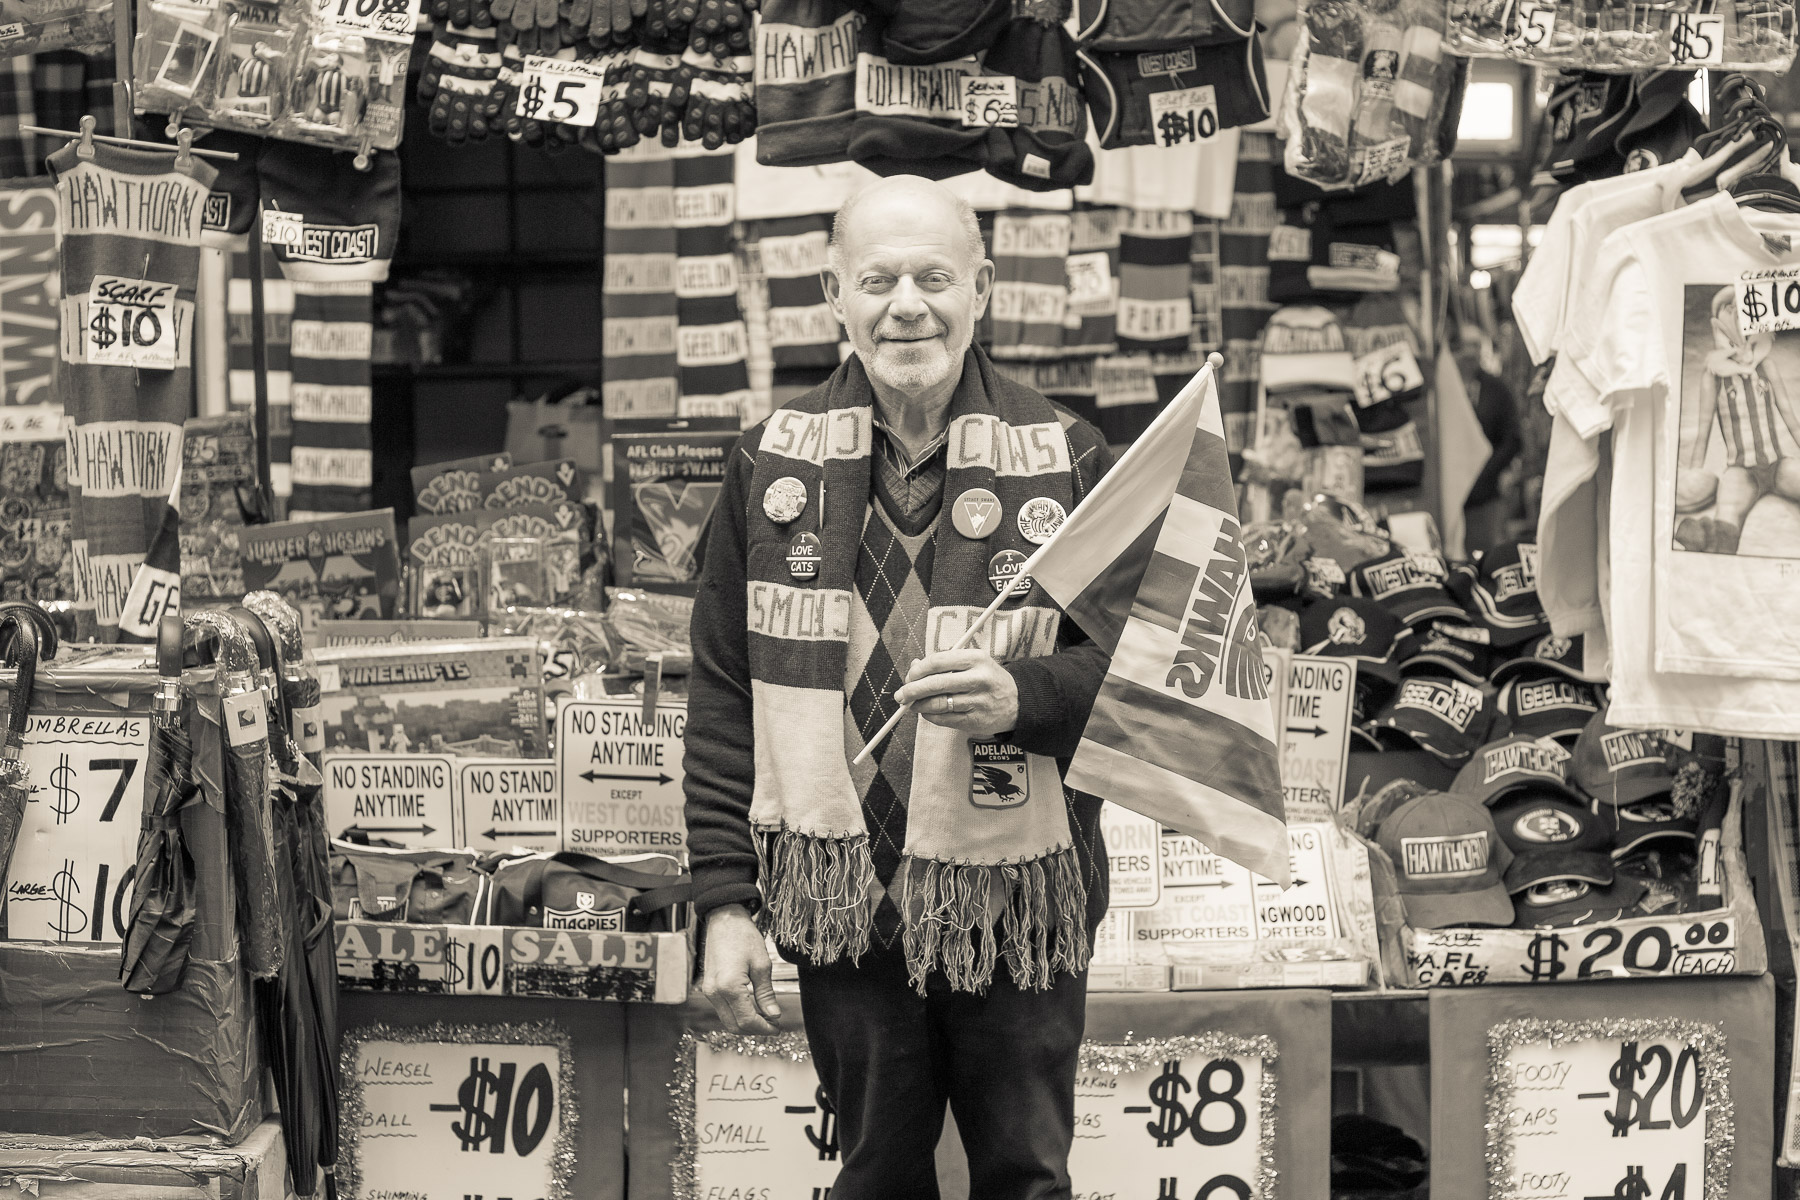 Footy paraphernalia market trader, Graeme. Photograph by  Emma Byrnes.